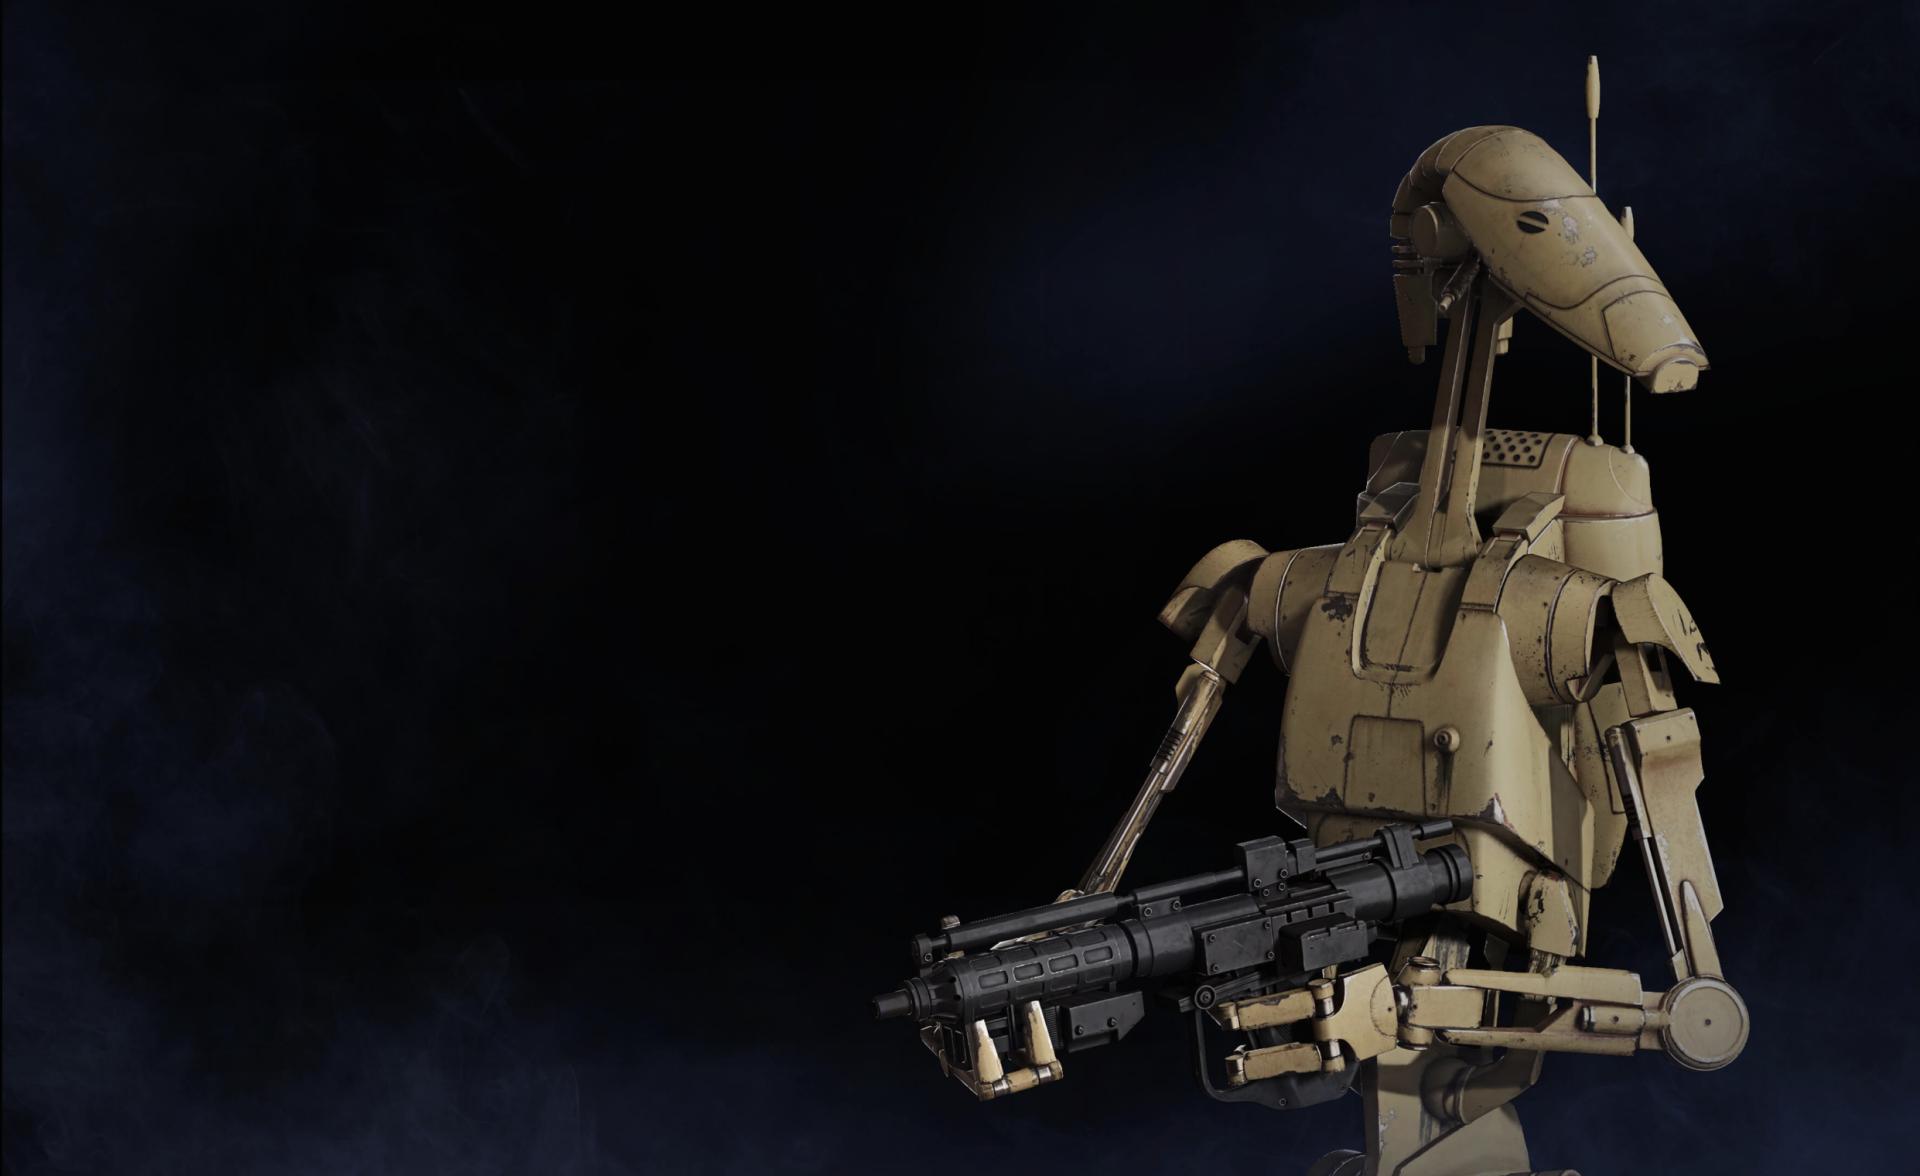 Star Wars Battlefront II (2017) HD Wallpaper | Background ...